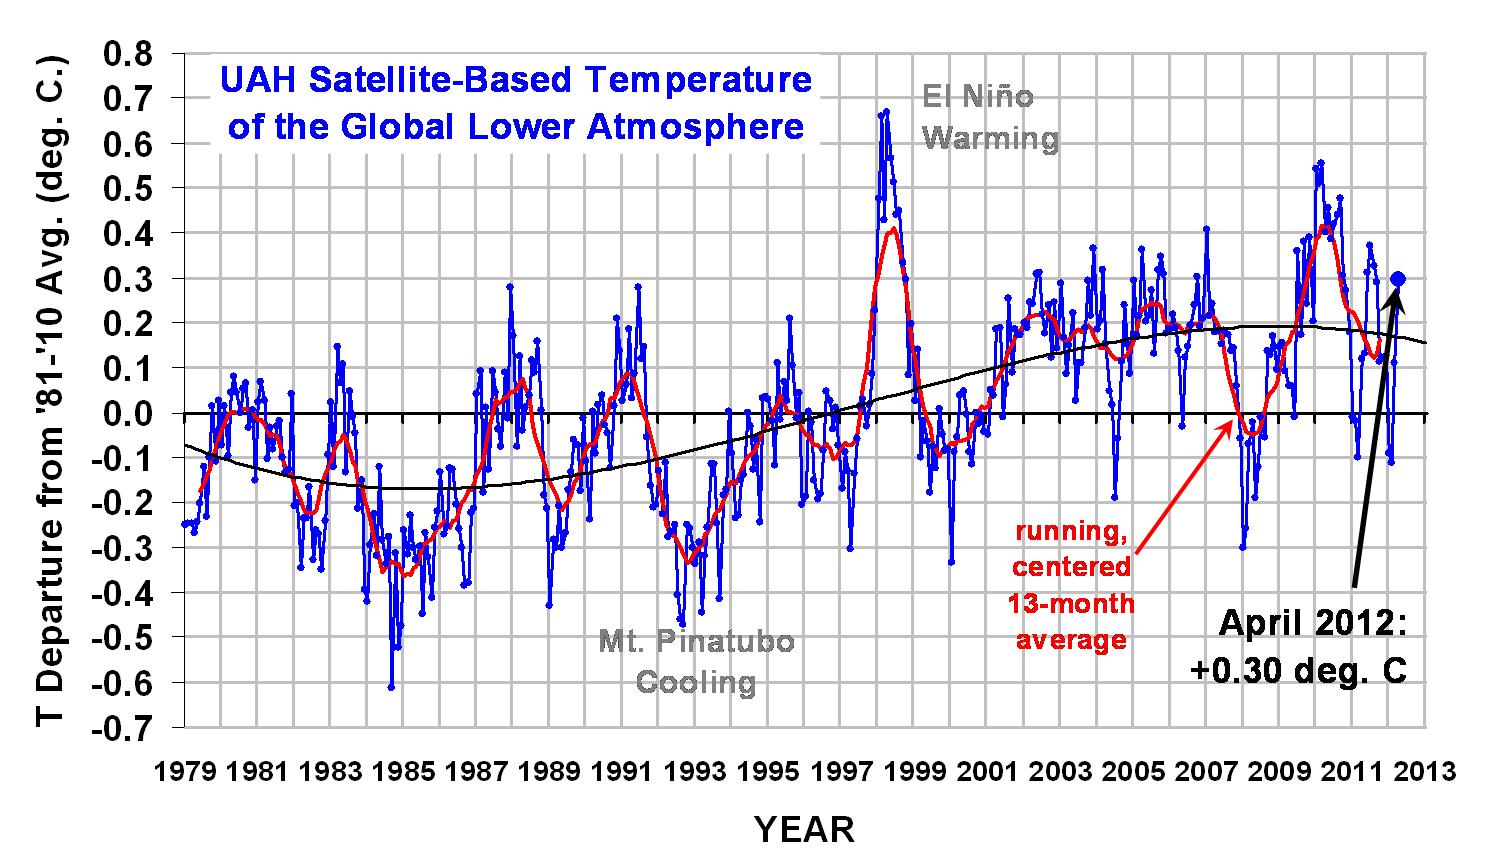 Global average temperature trends thru April 2012